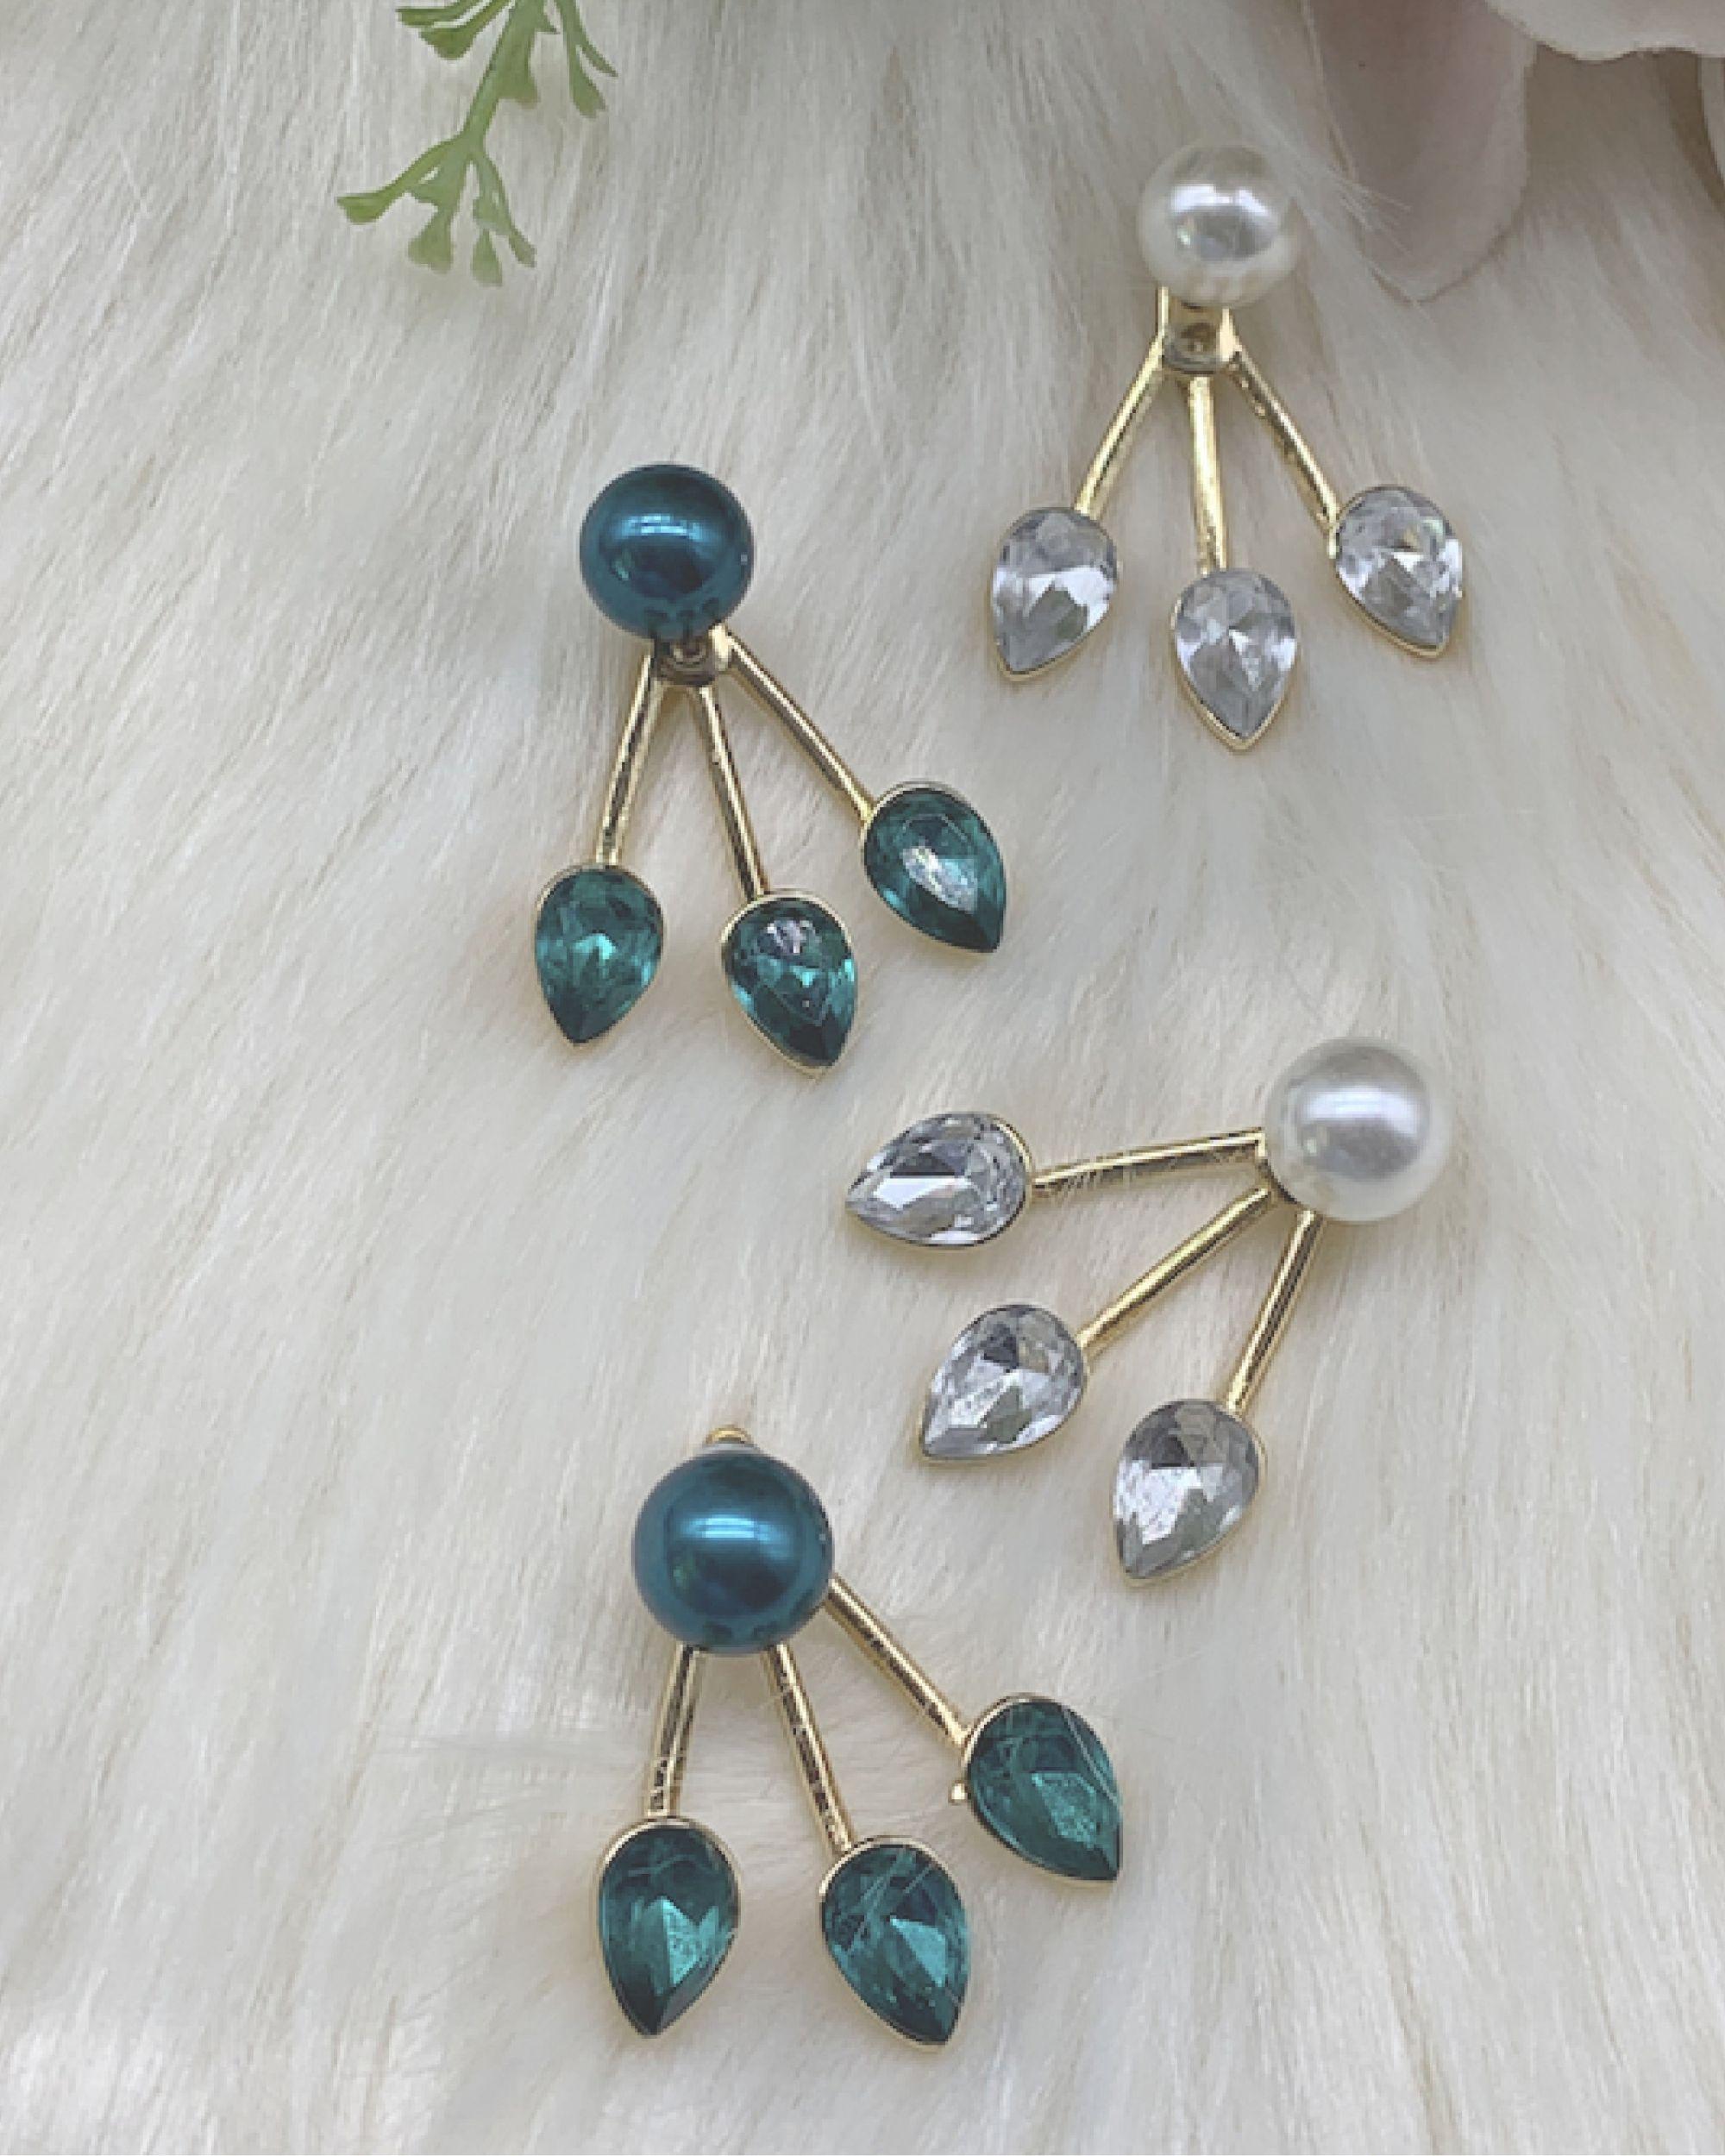 Emerald green and white detachable earrings